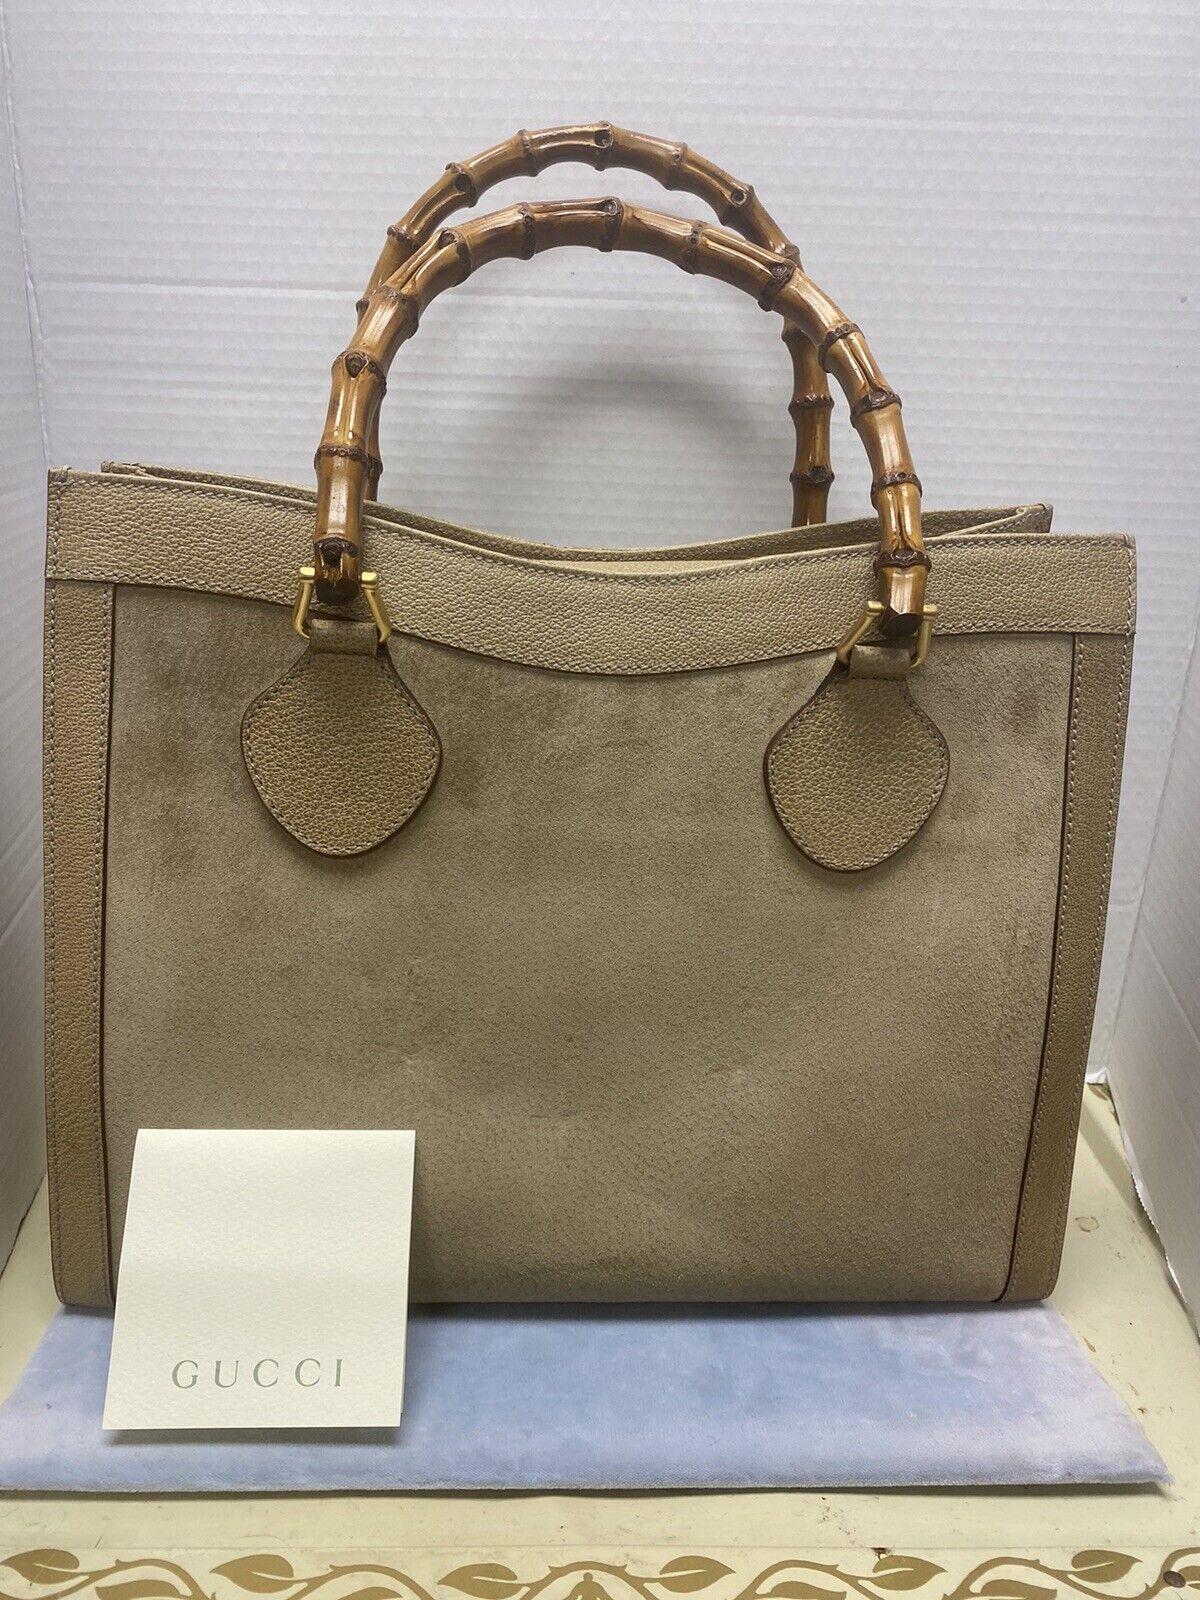 Gucci Handbag Tote Leather Diana Bamboo Handle Bo… - image 1